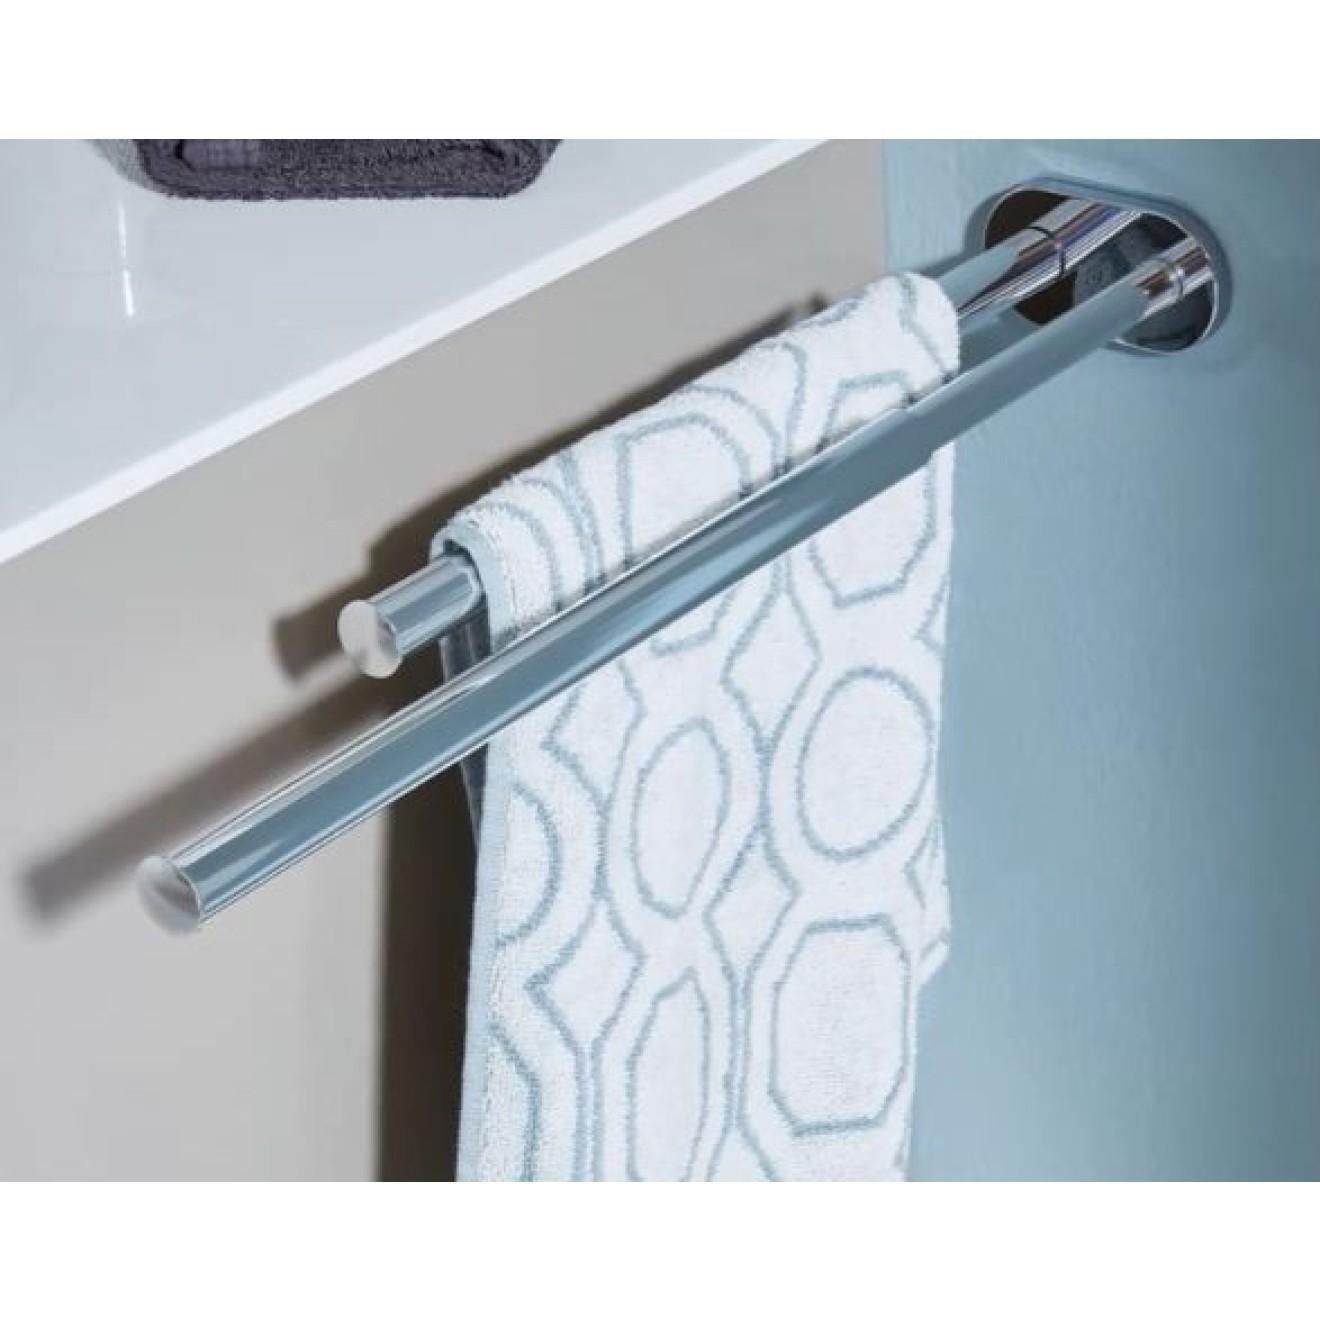 handtuchhalter 2 armig teleskopisch ausziehbar wandmontage 33 cm aluminium poliert treffpunkt. Black Bedroom Furniture Sets. Home Design Ideas